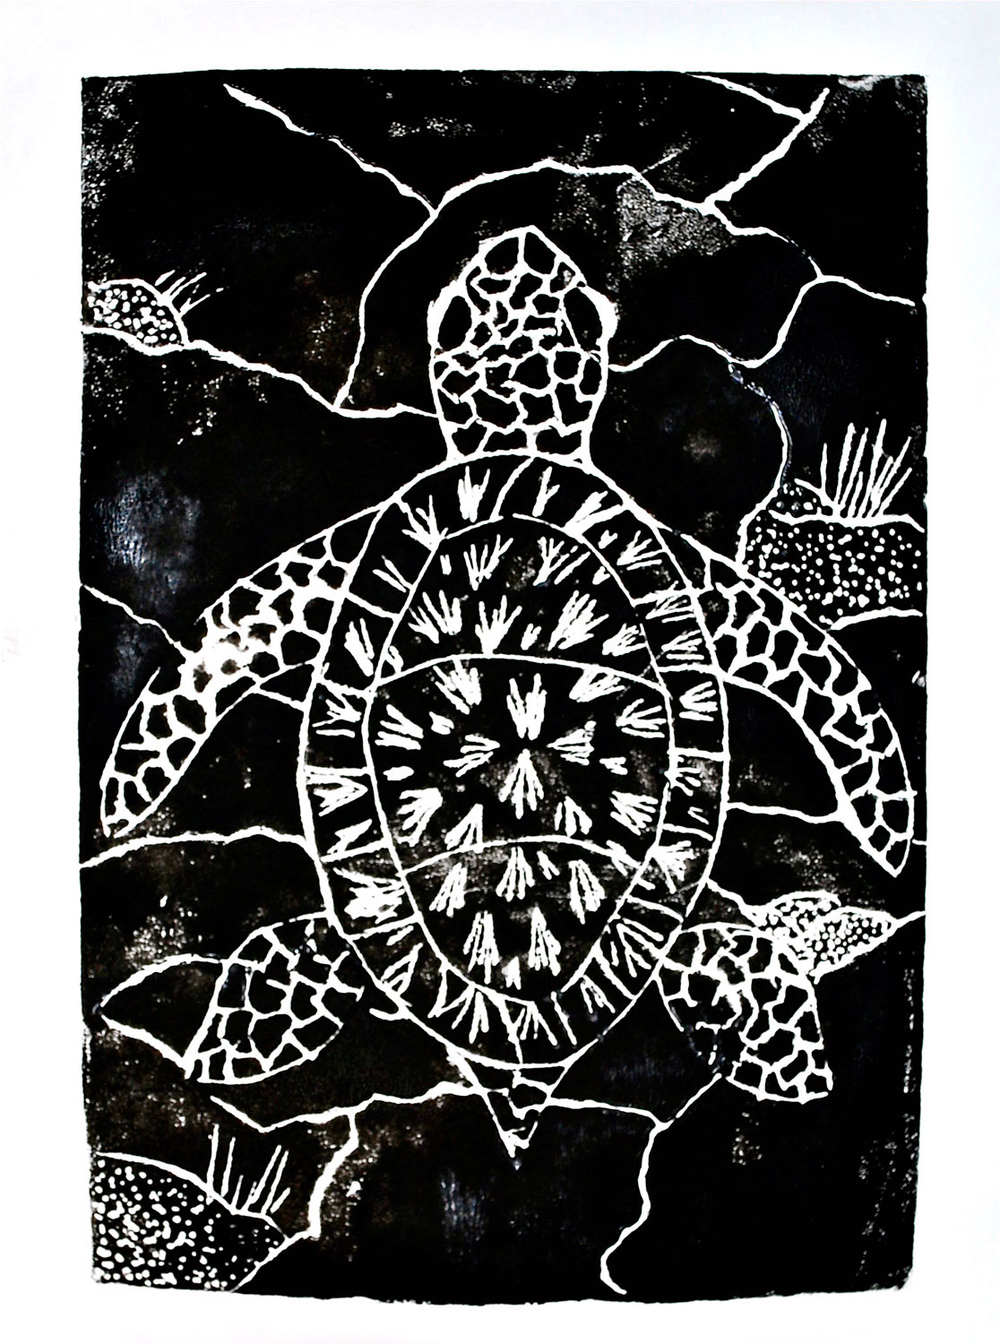 turtle_corrected.jpg